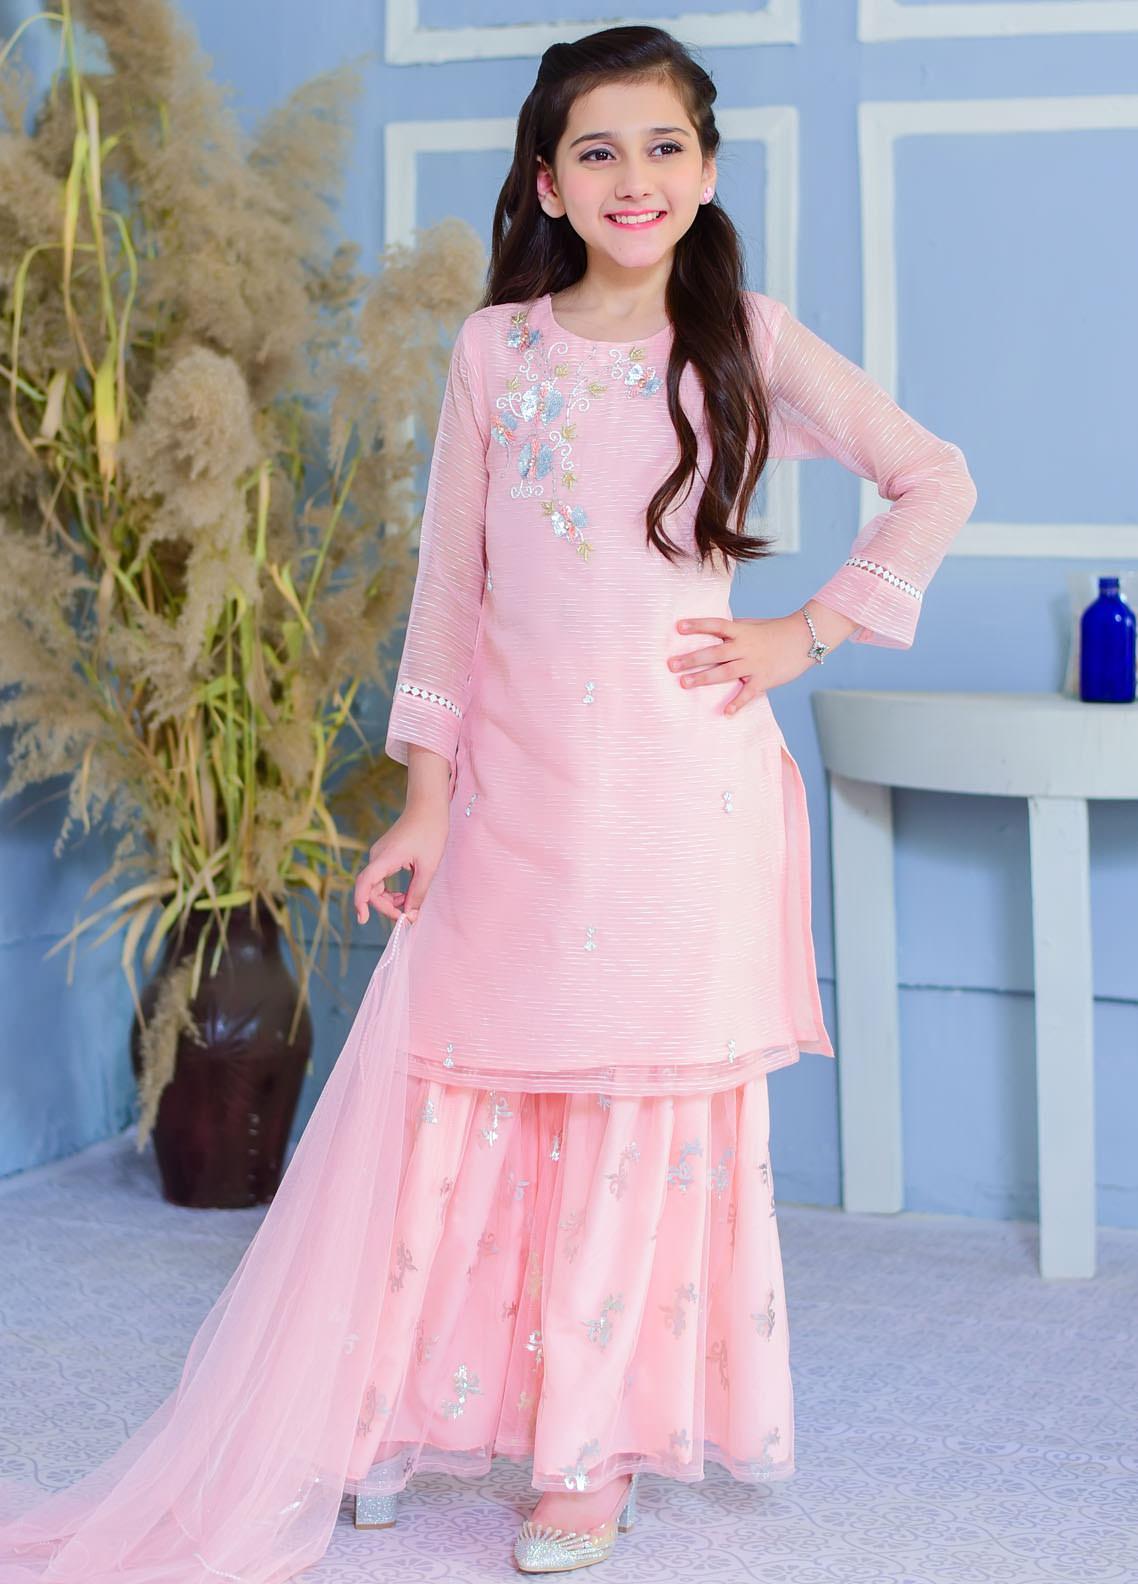 Ochre Chiffon Fancy 3 Piece for Girls -  OFW-332 Pink